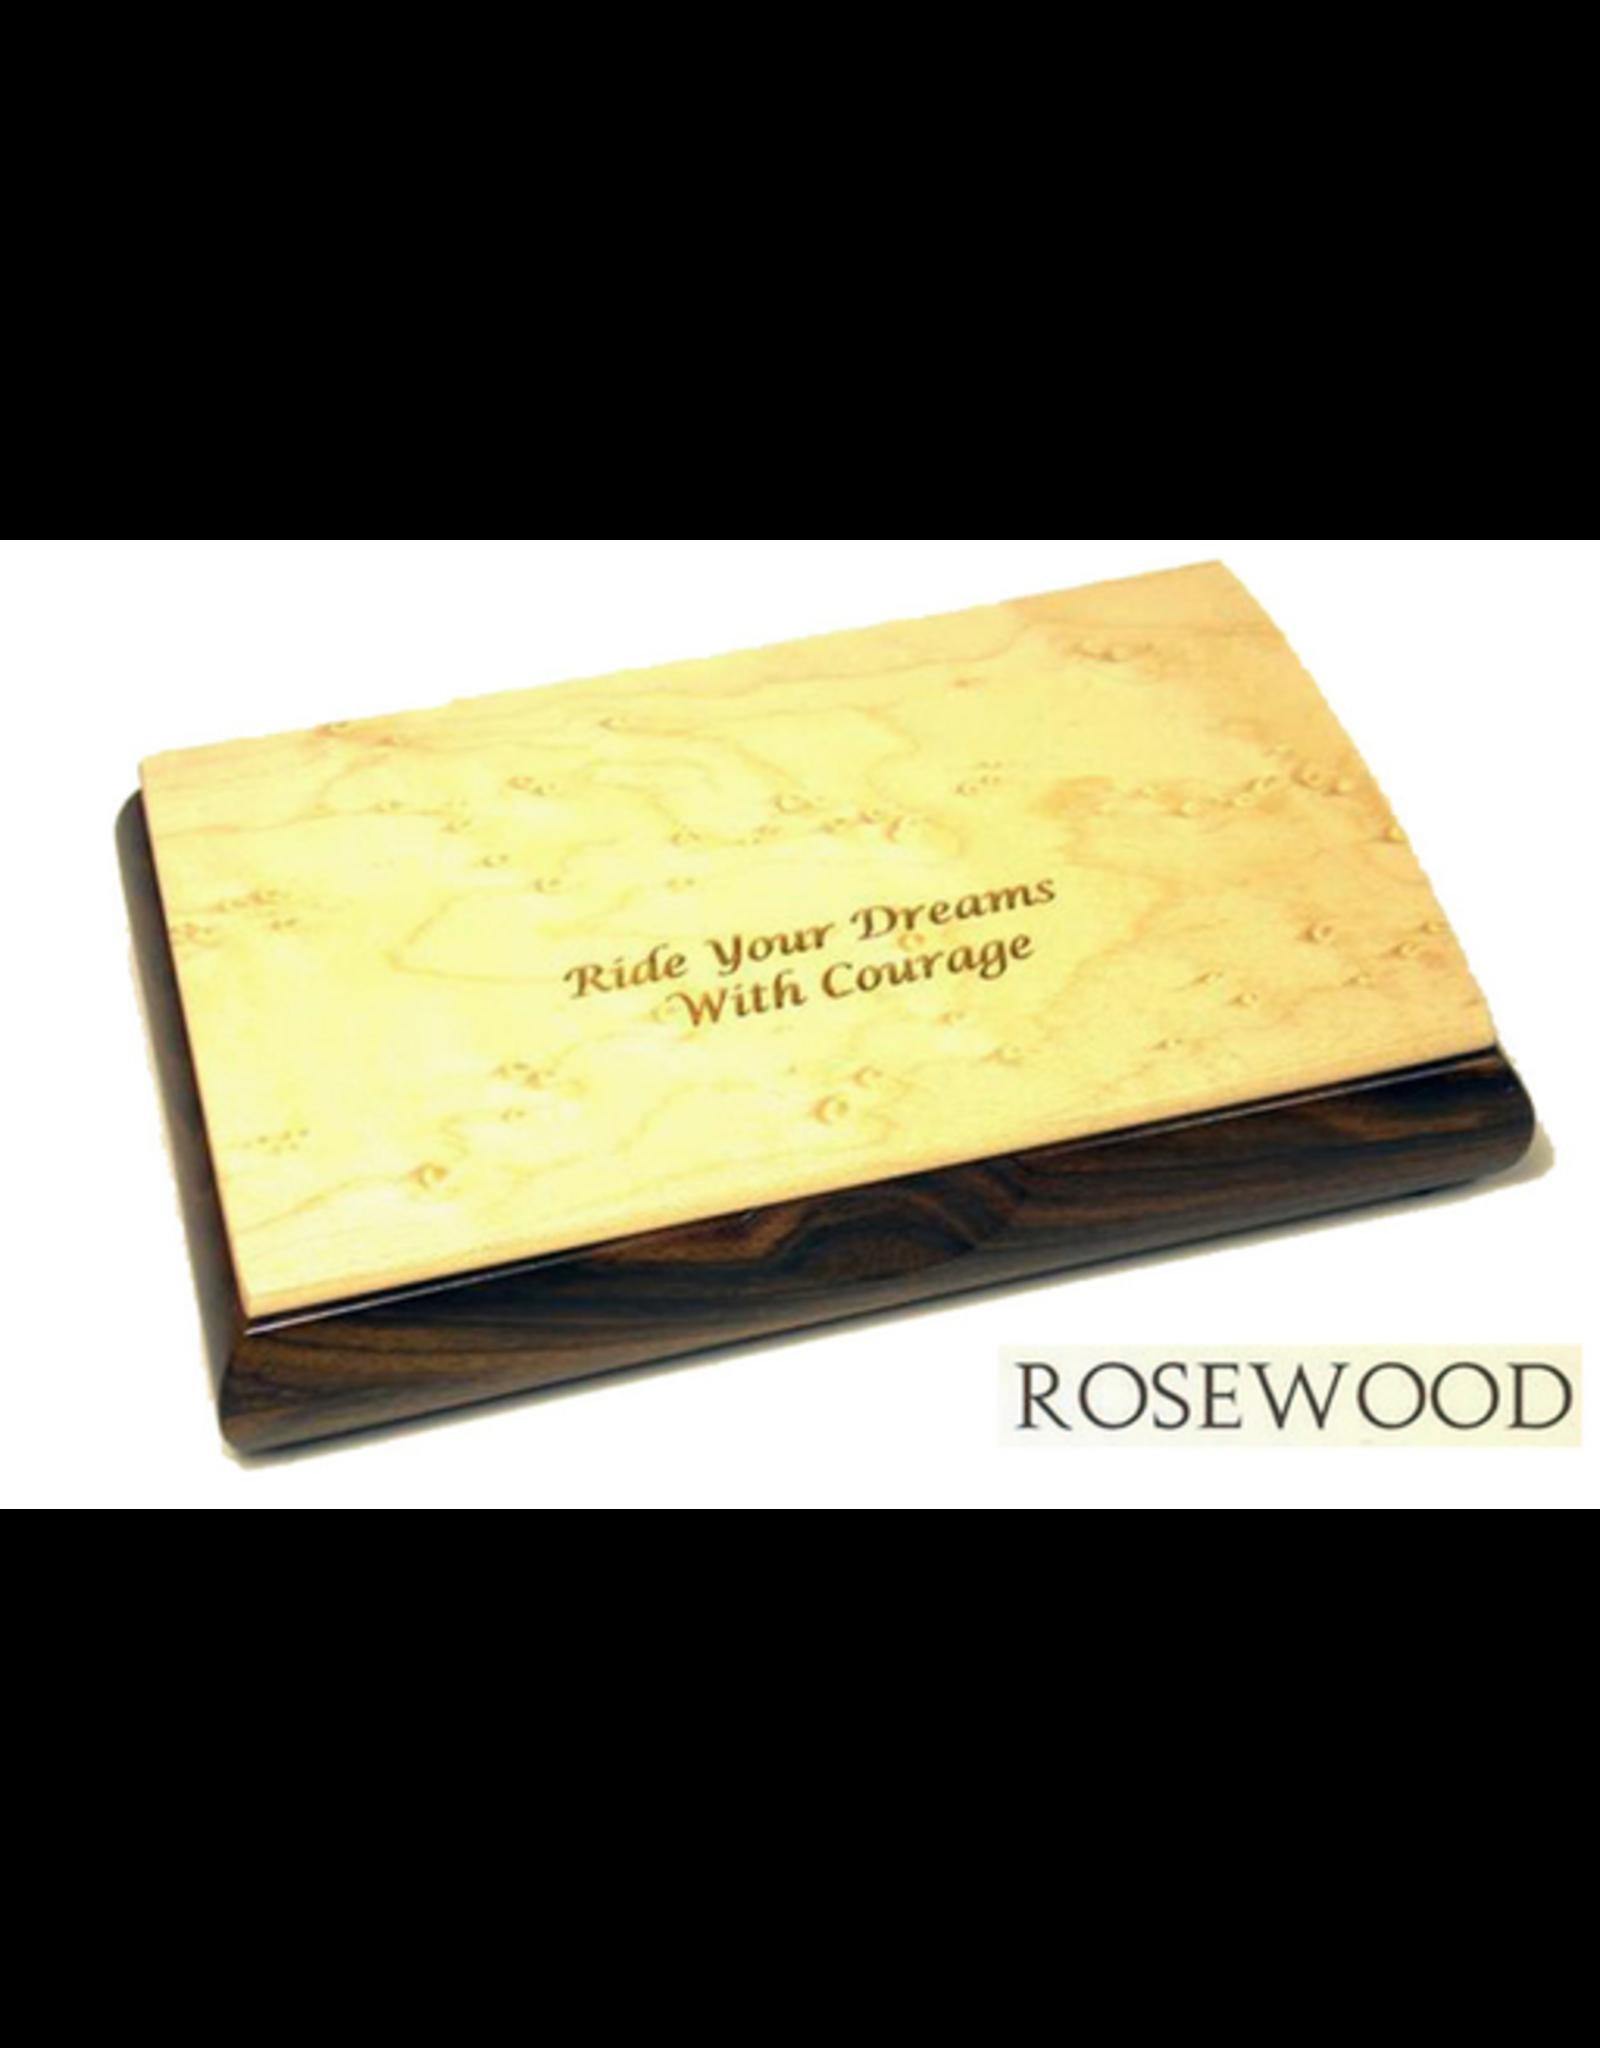 Mikutowski Woodworking POSSIBILITY WOOD BOX (Custom Engraved Sentiment)